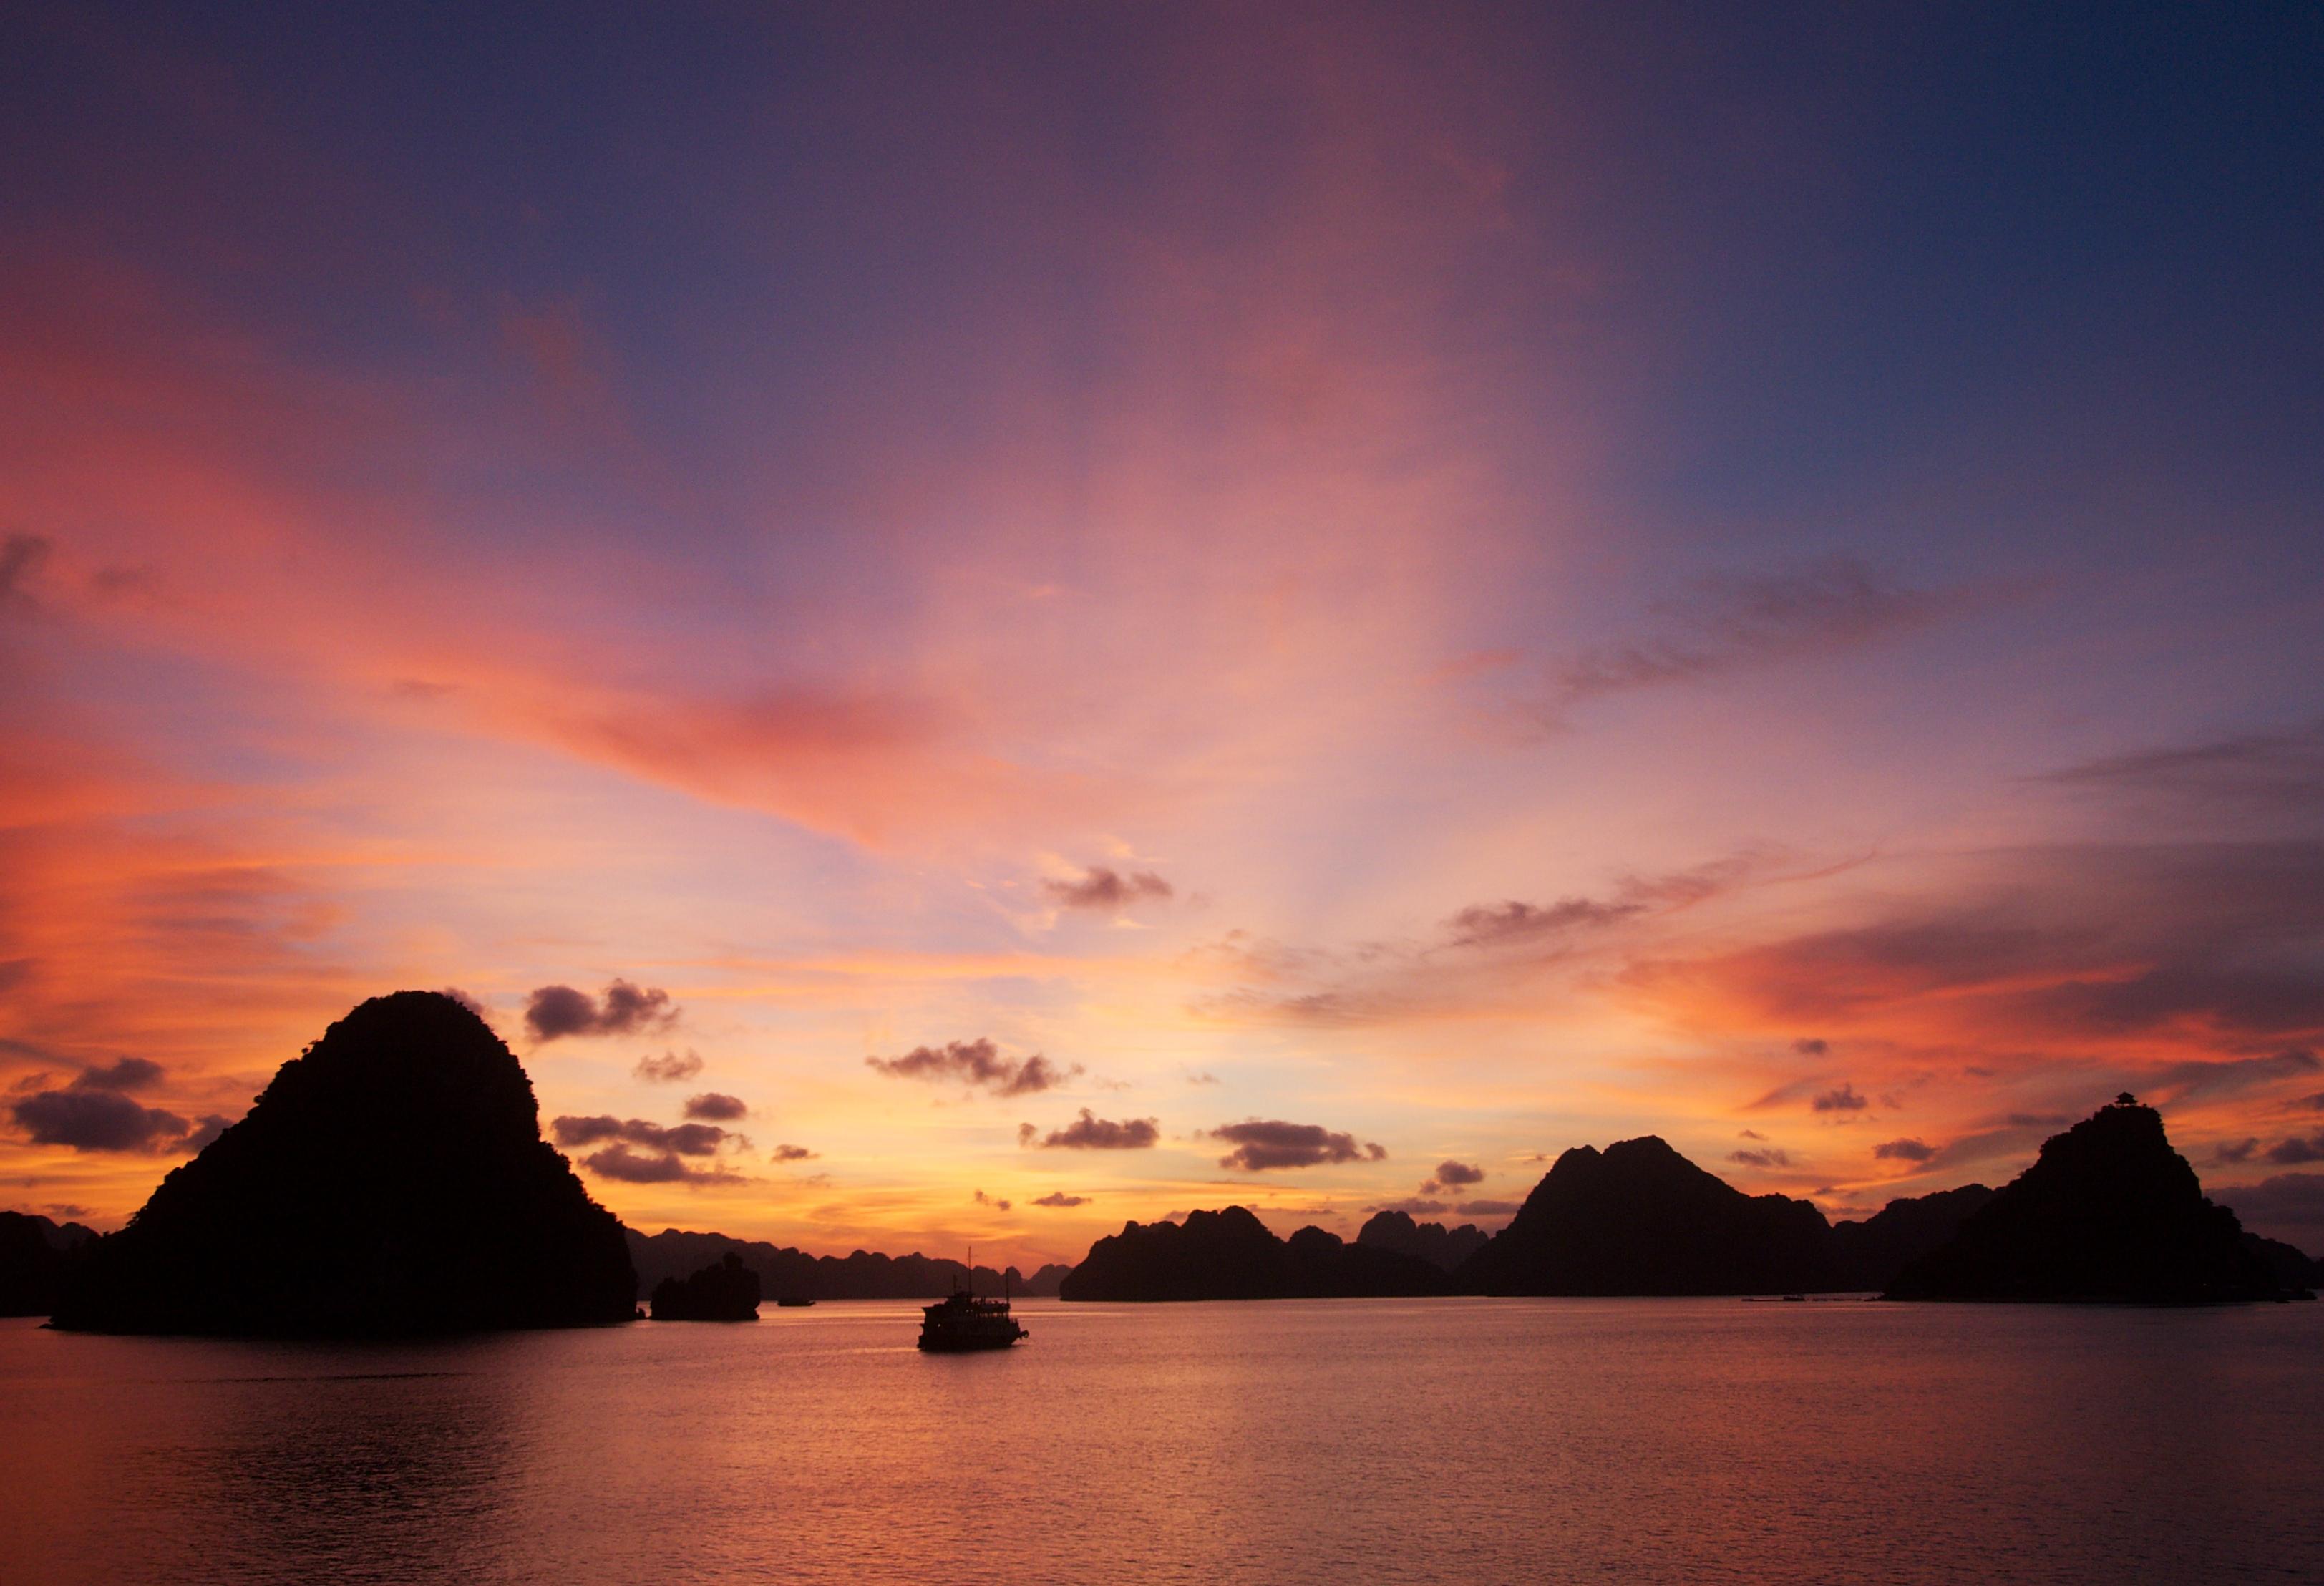 File:Sunset at Halong Bay.jpg - Wikimedia Commons